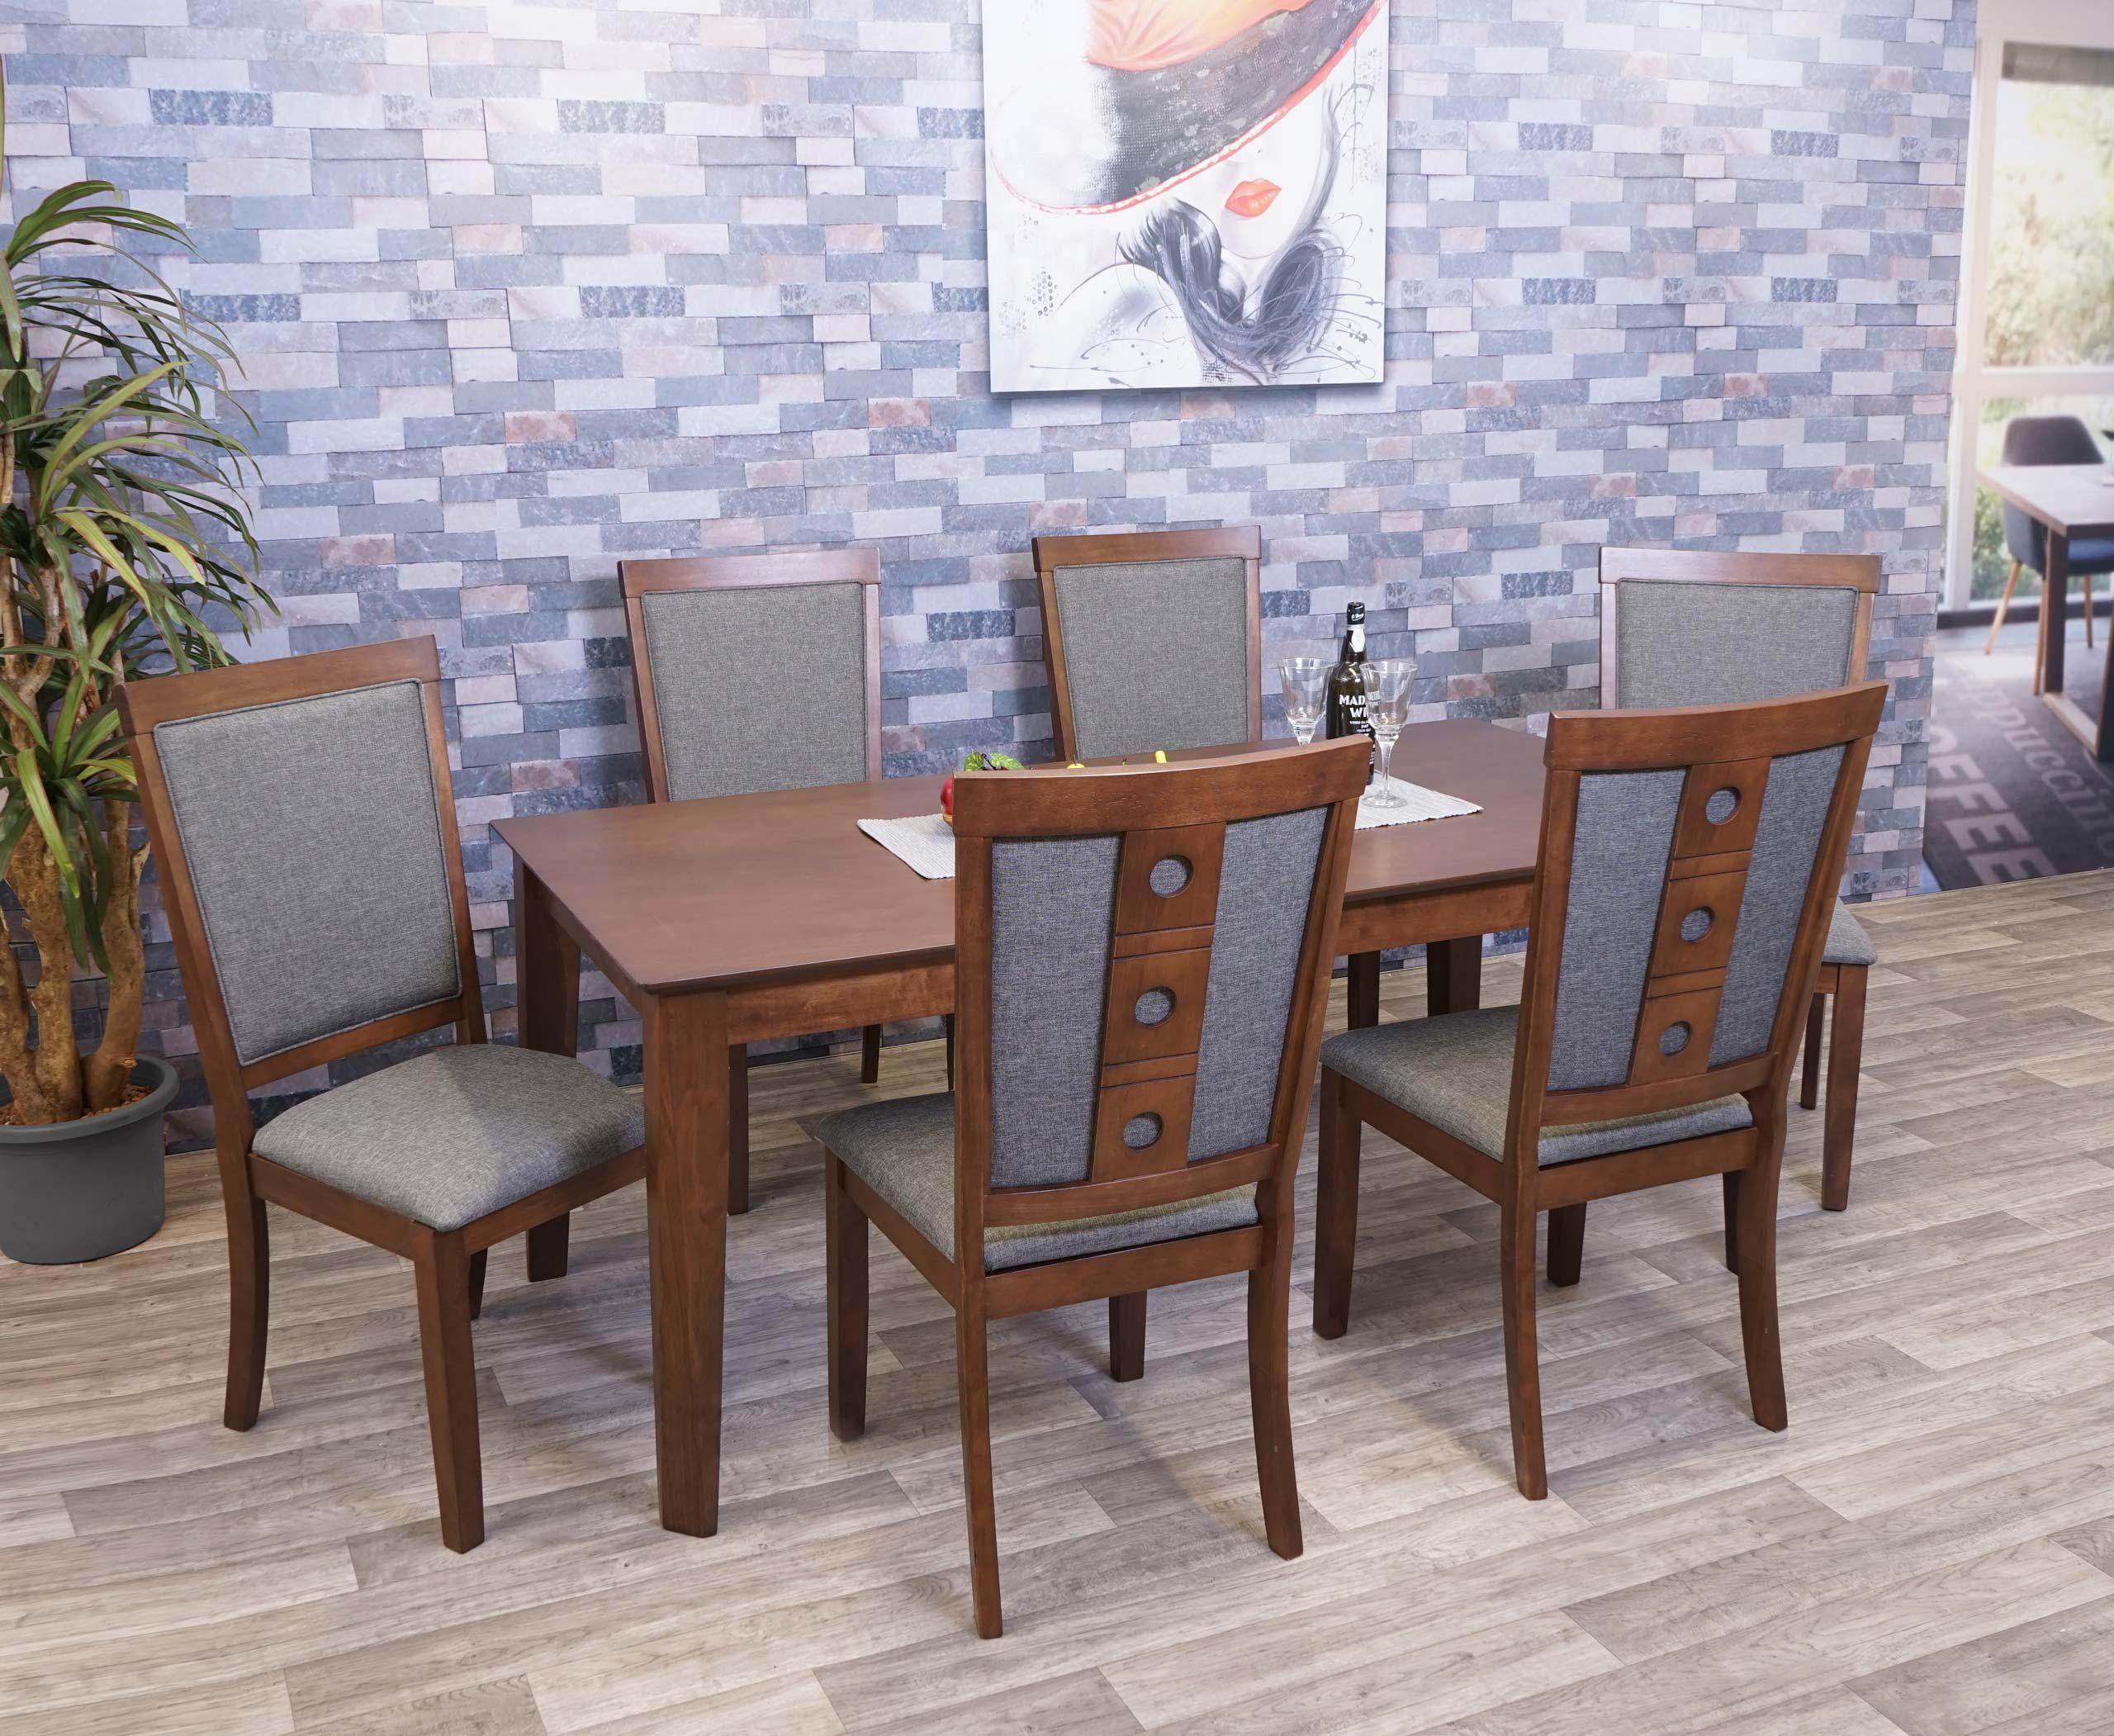 Mendler Esszimmer-Set HWC-G61, Sitzgruppe Esszimmergruppe Esszimmergarnitur, Stoff/Textil Massiv-Holz ~ Vari 3x71809+71816